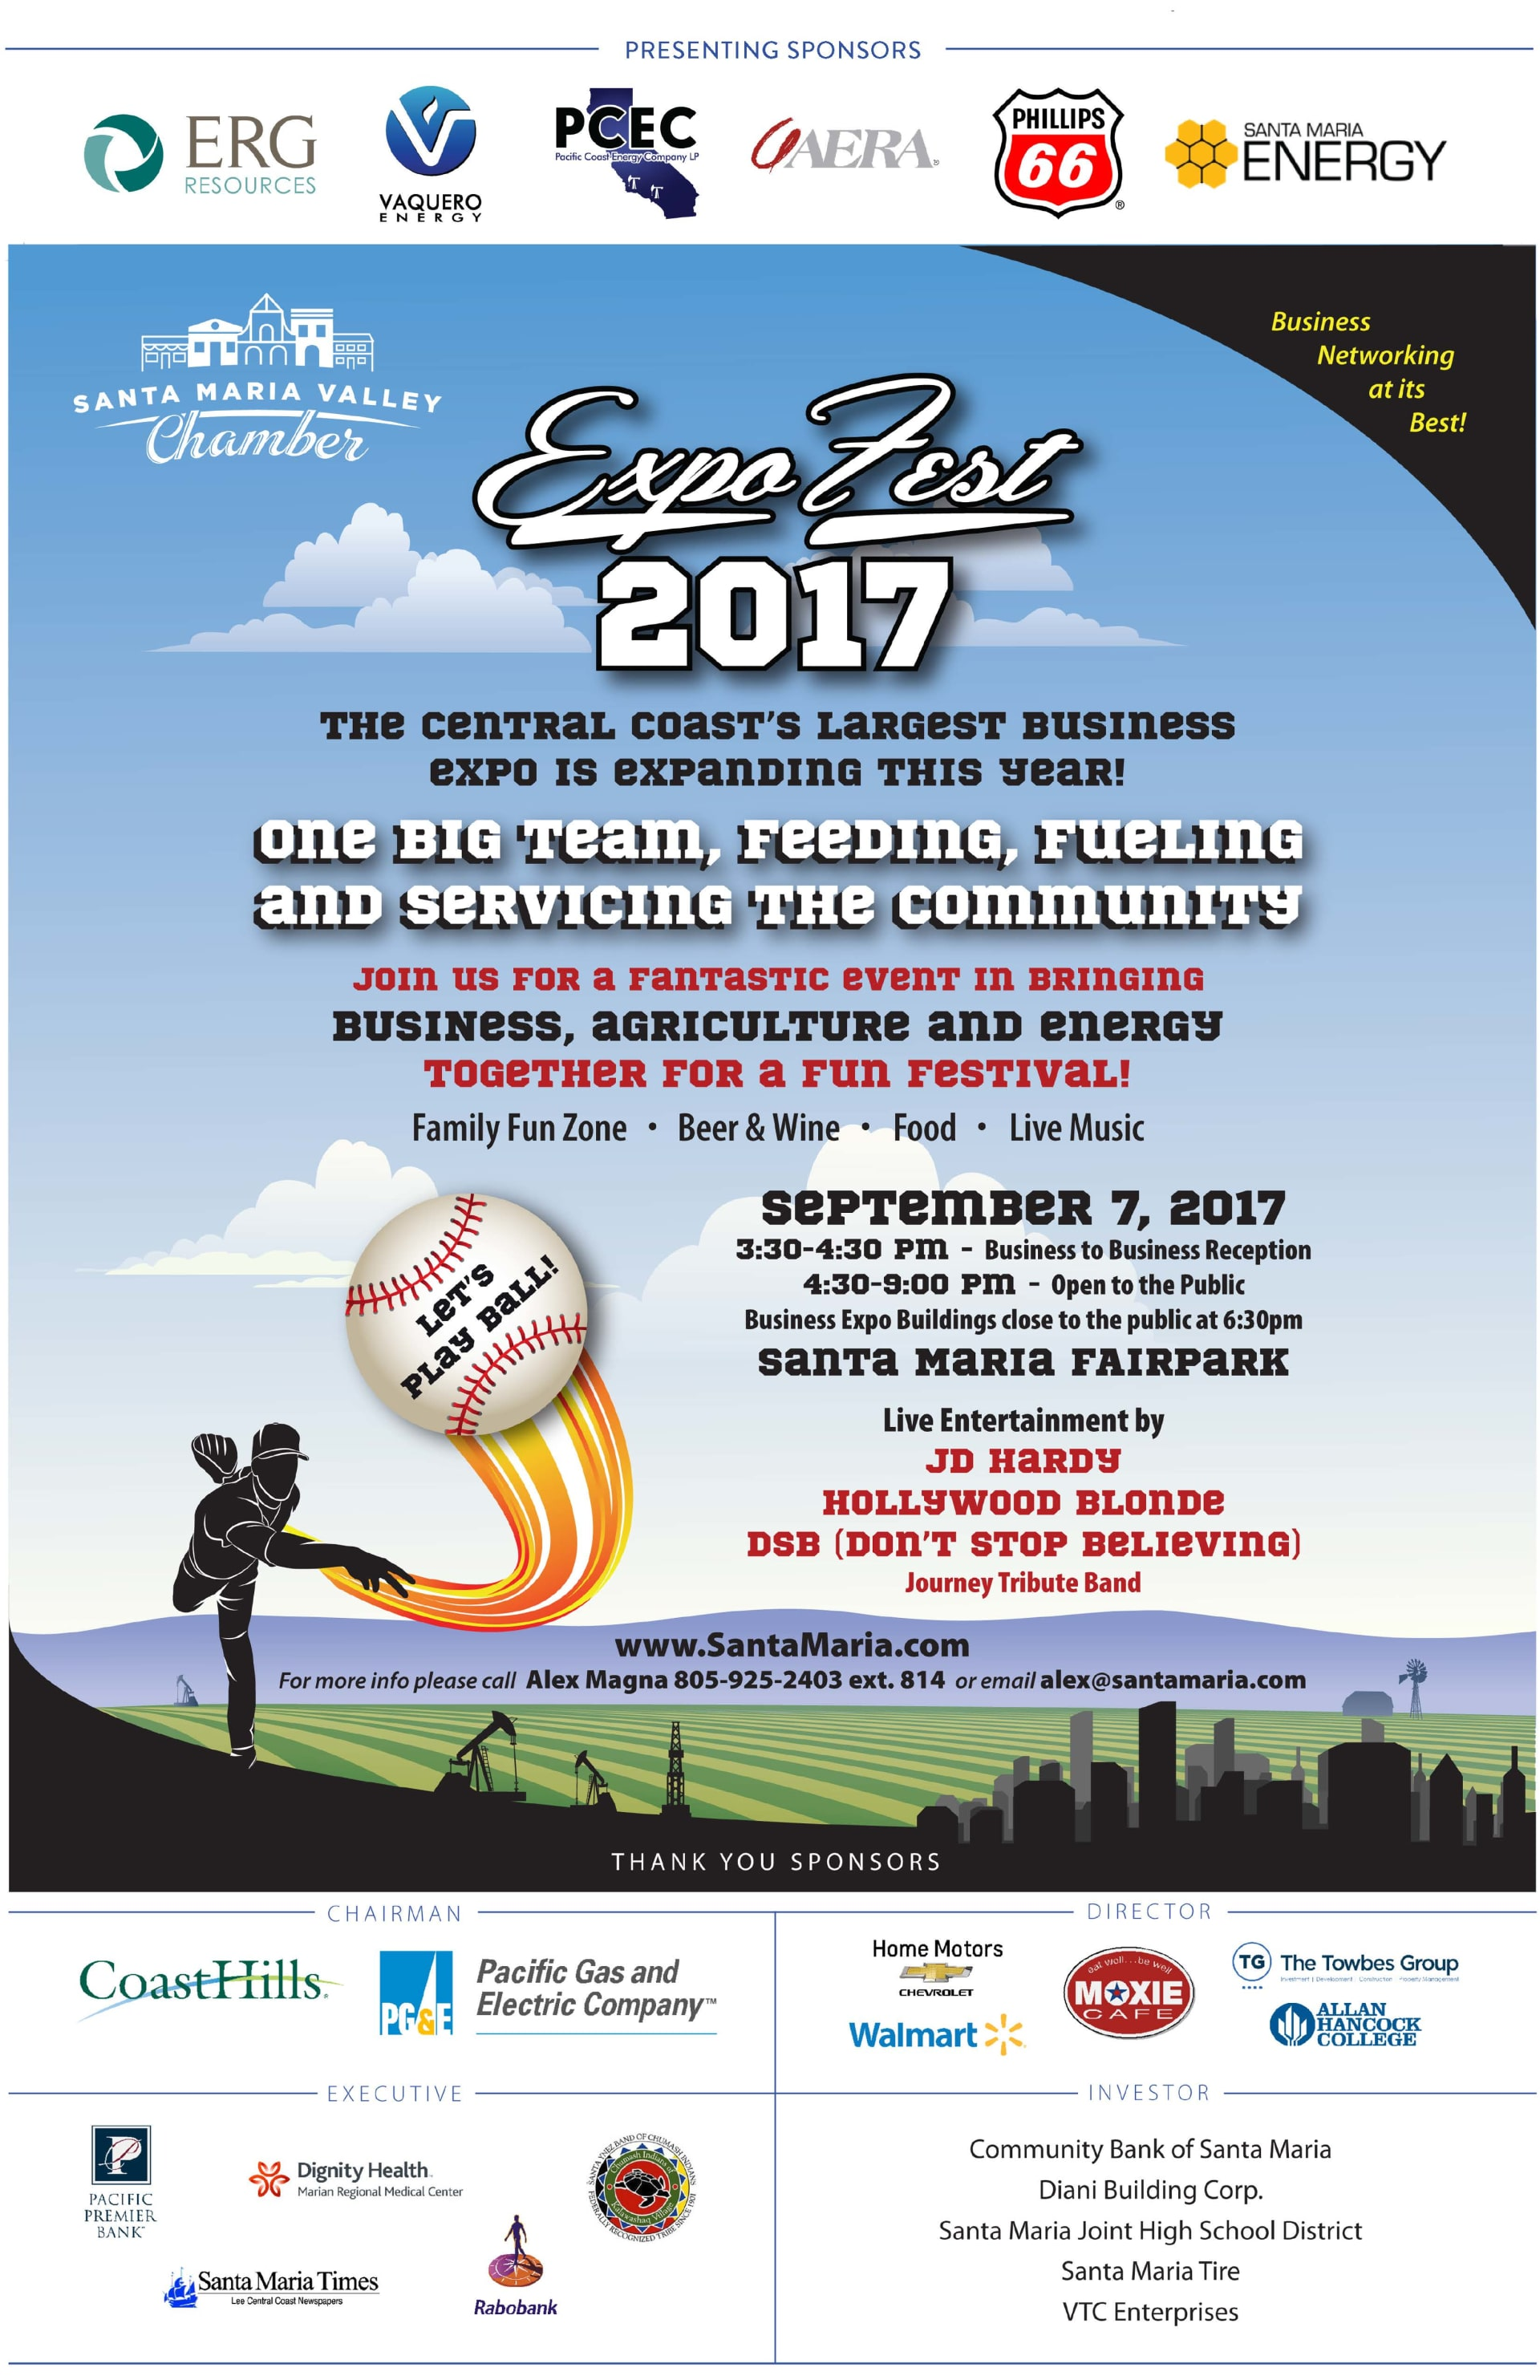 Santa Maria Chamber ExpoFest 2017